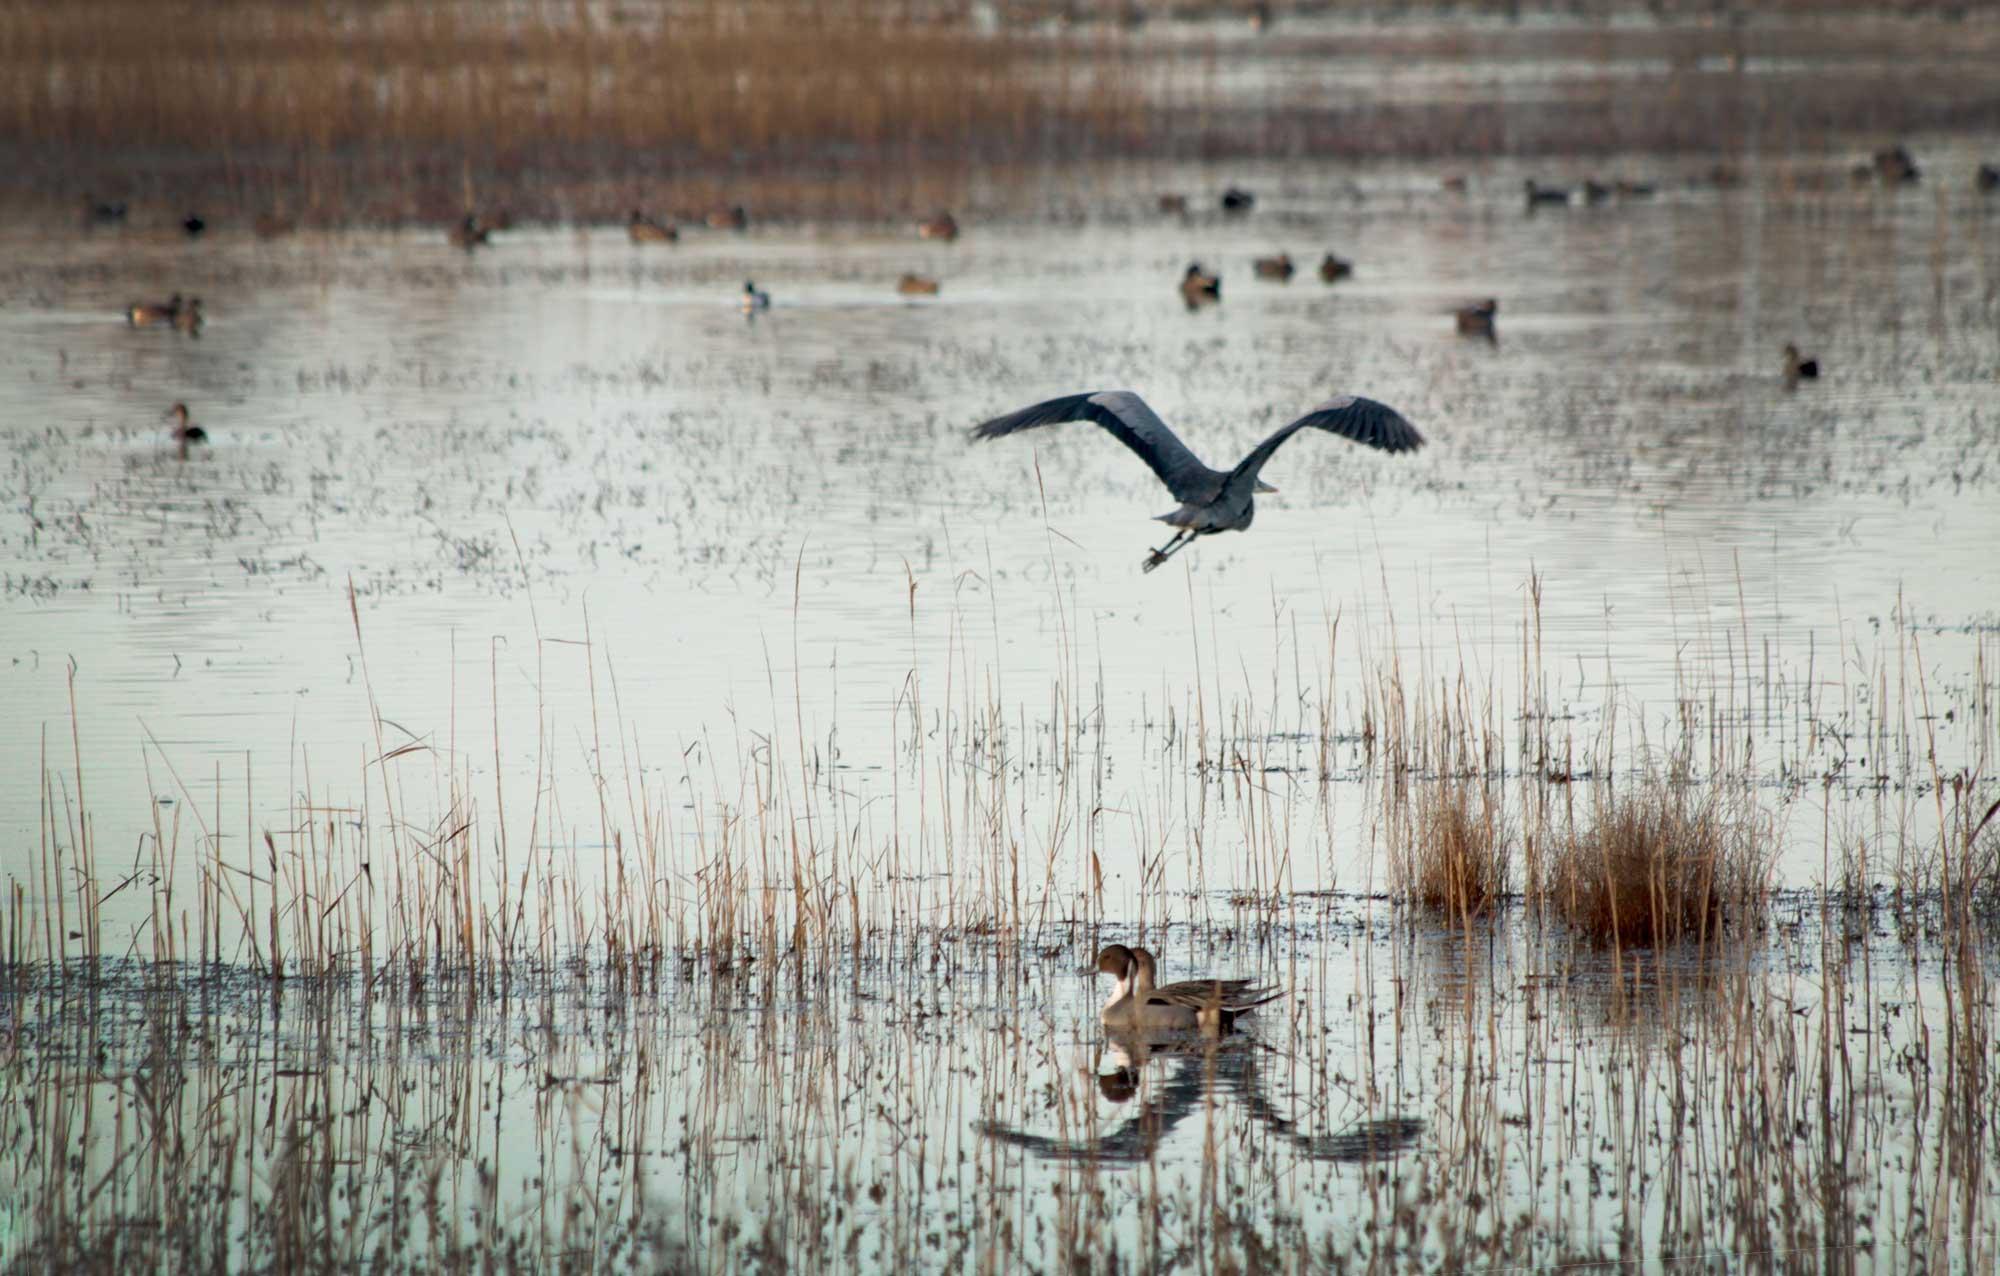 great blue heron flying over Lake Mattamuskeet with ducks in the marsh